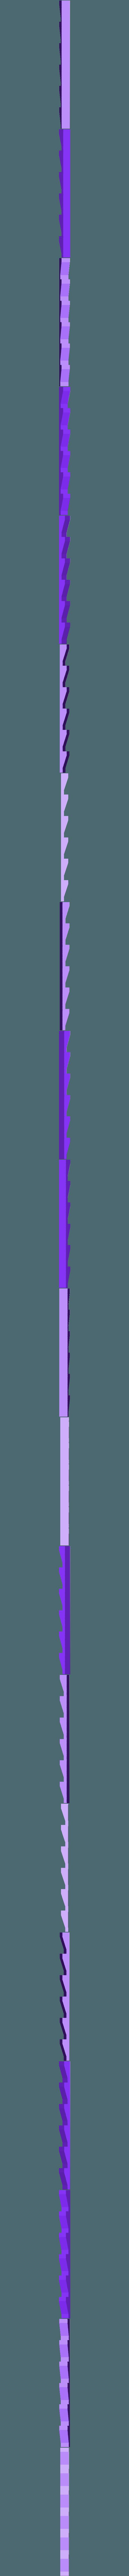 P-6_150mm.stl Download free STL file Laser Lifting Feet • 3D printing template, dancingchicken